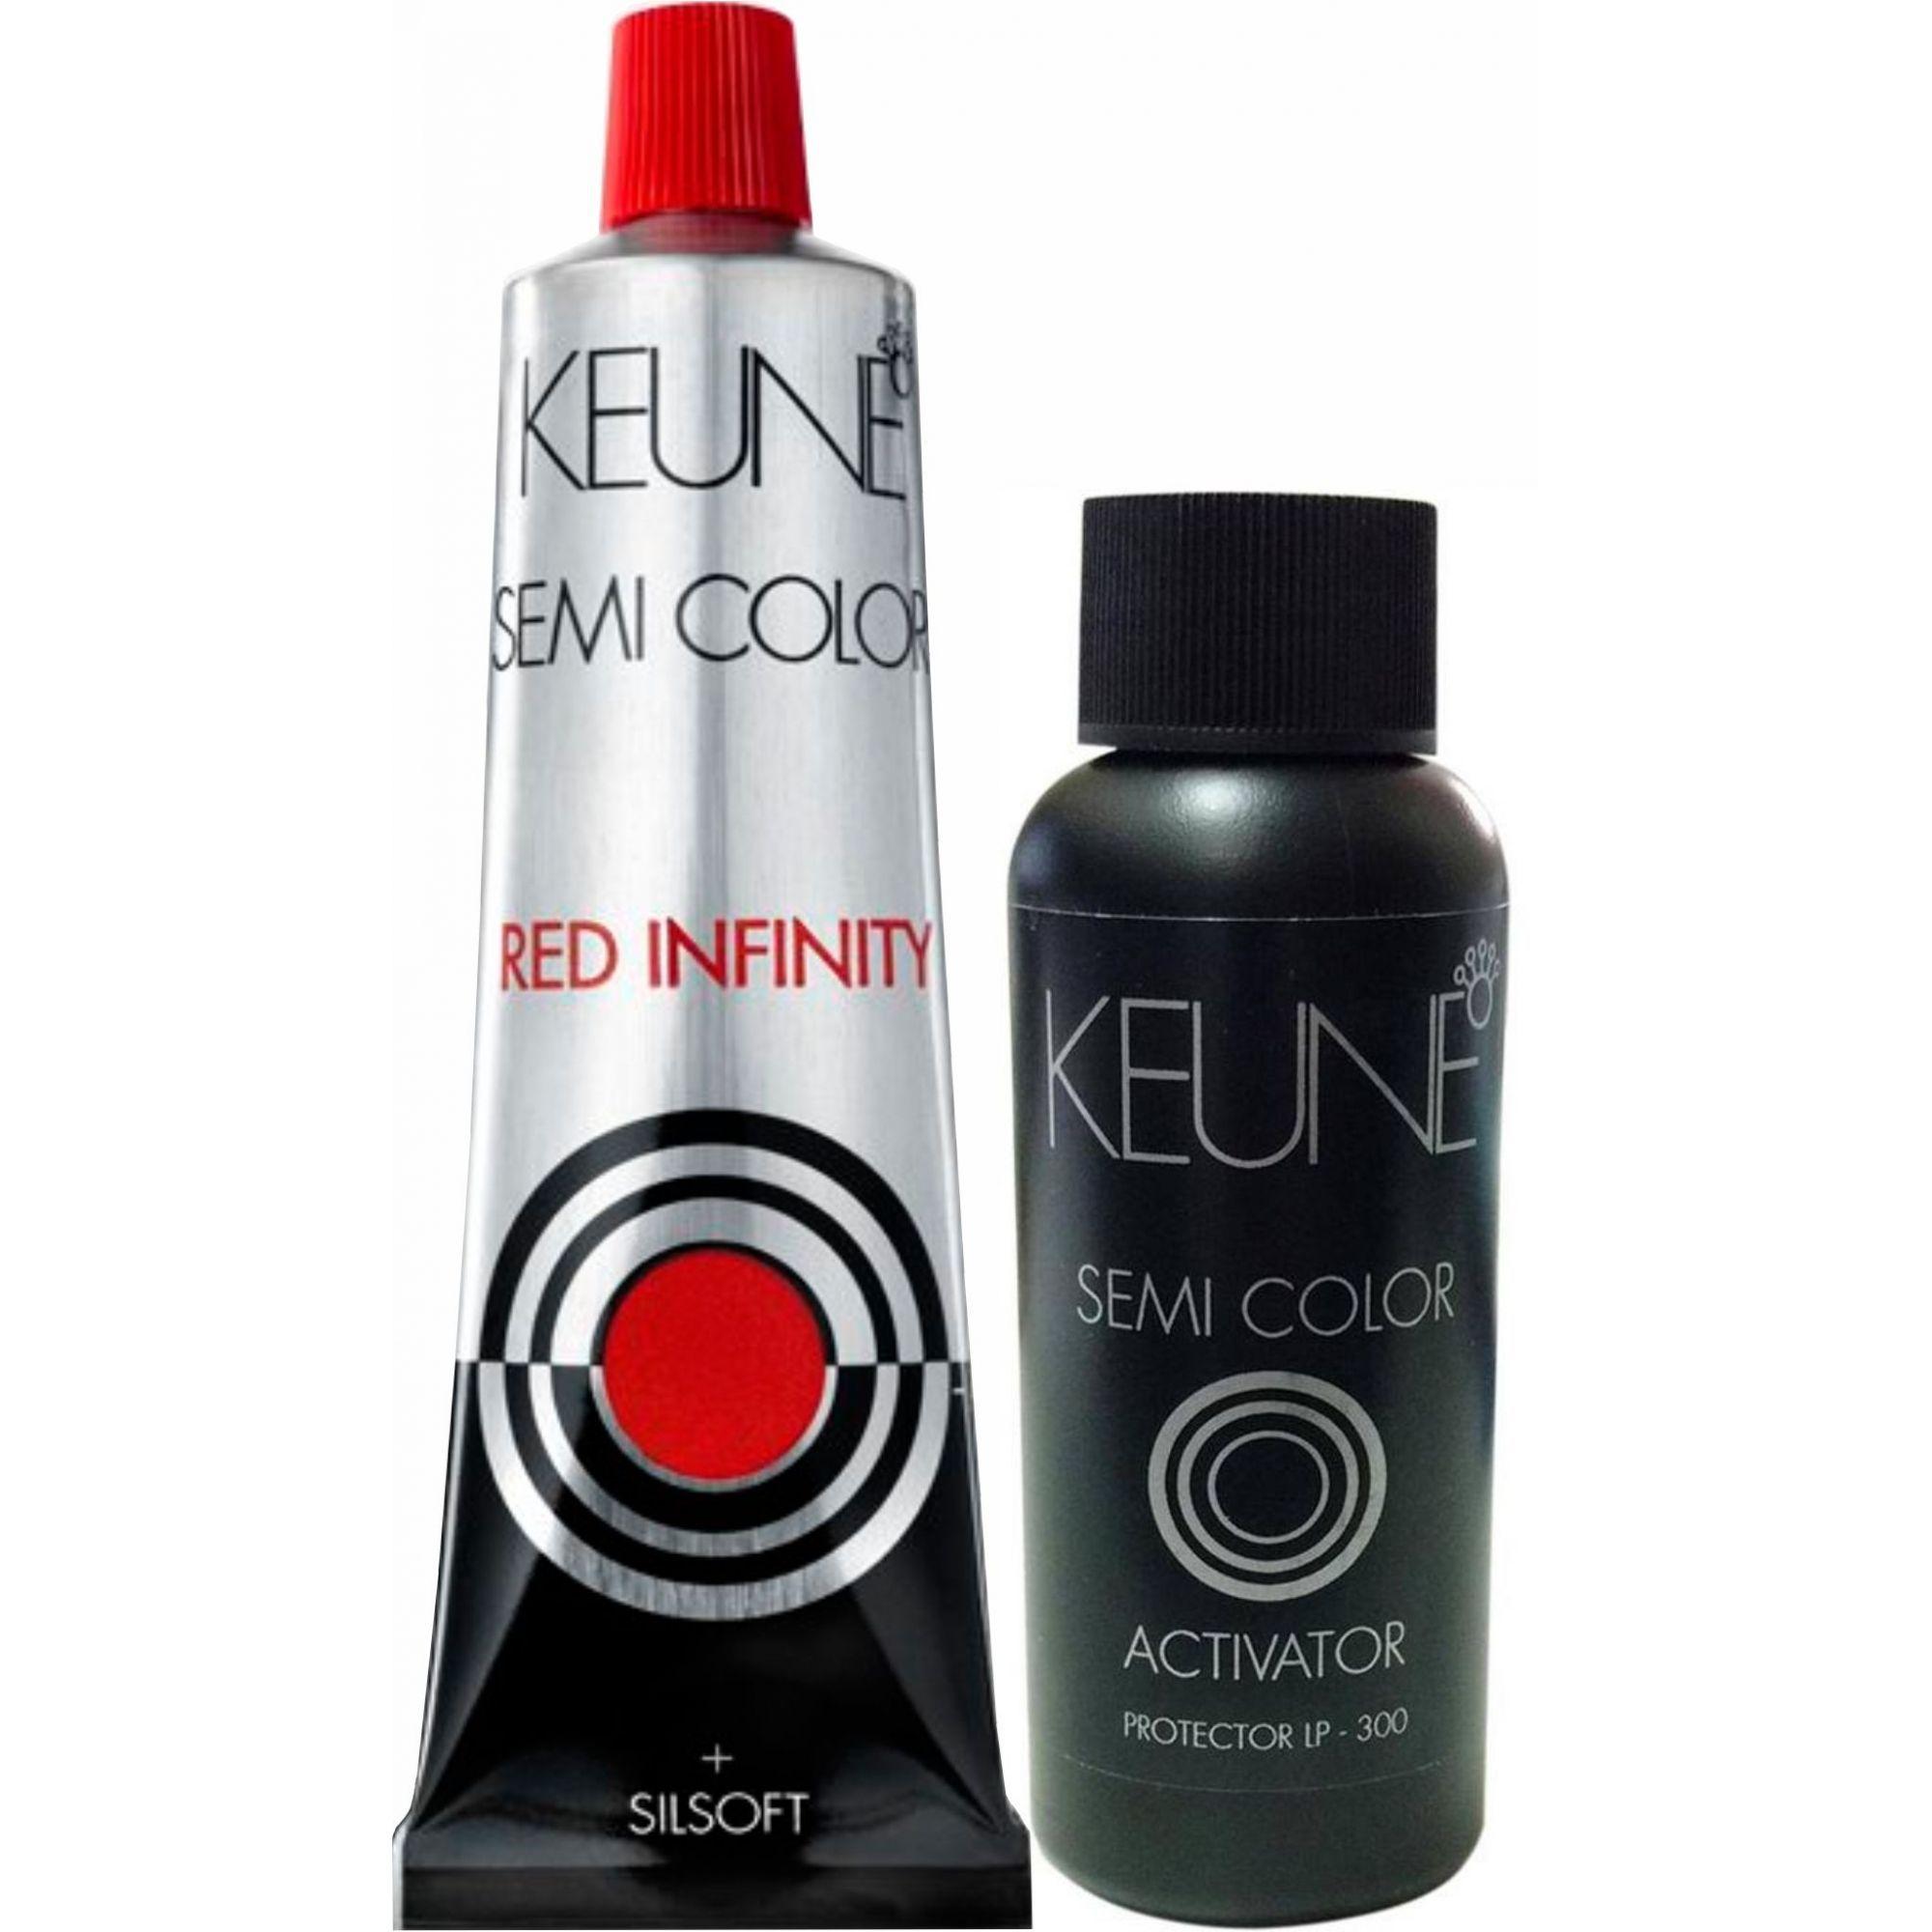 Kit Keune Tonalizante RI 60ml - Cor 6.66 - Vermelho Intenso + Ativador de 60ml